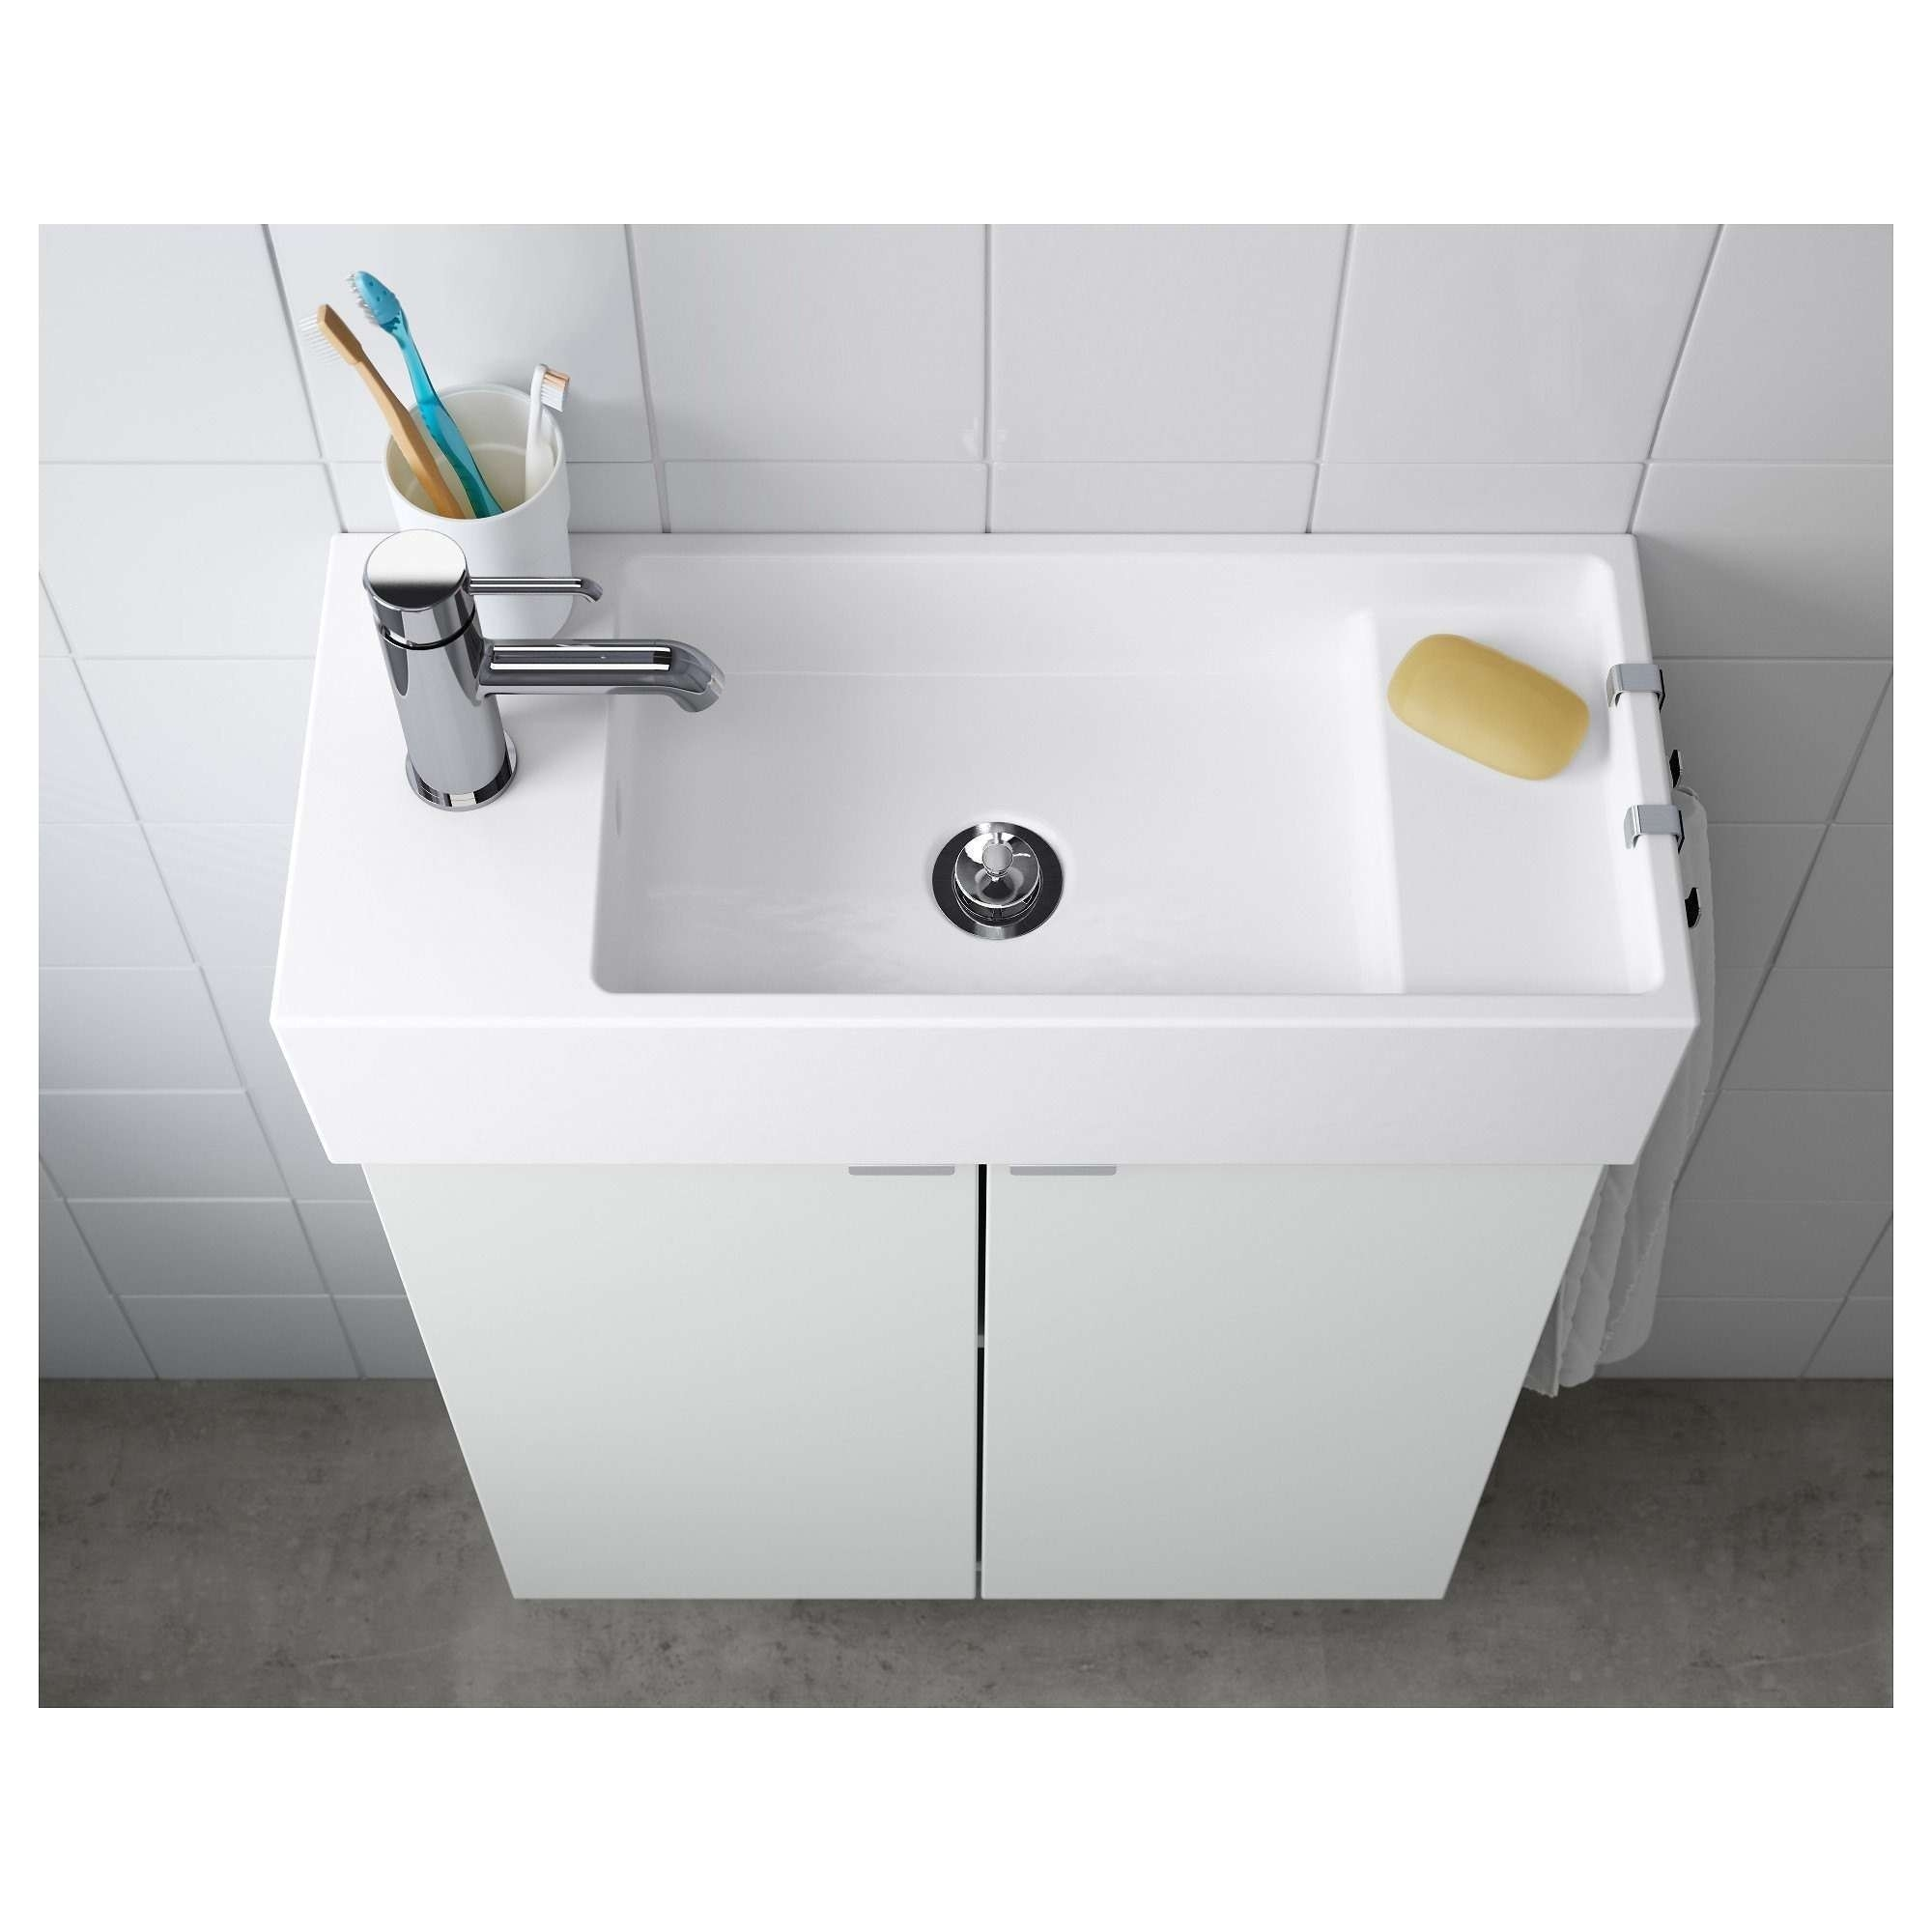 apartment bathroom ideas fresh cheap small bathroom sinks fresh pe s5h sink ikea small i 0d